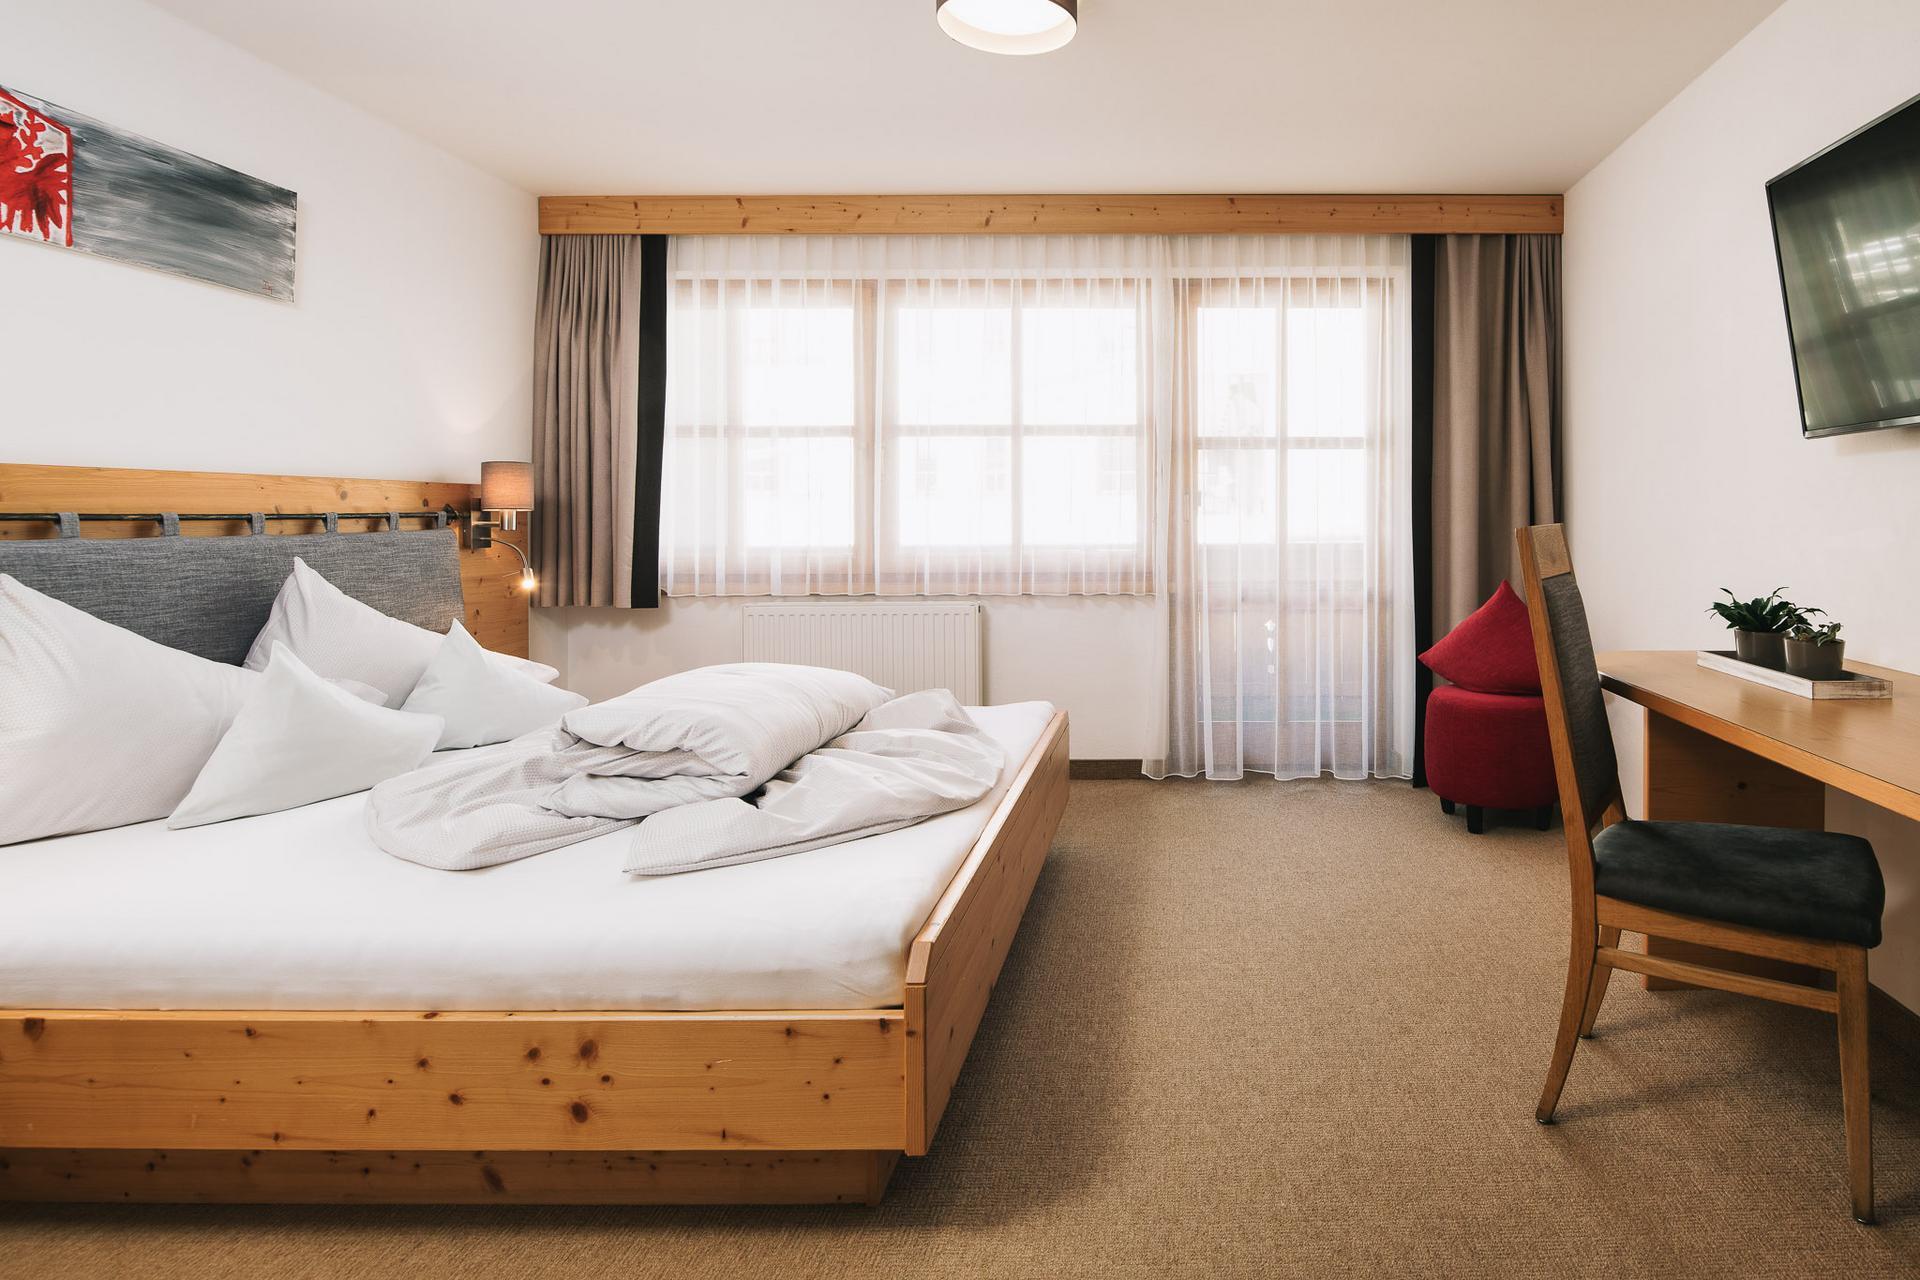 Winter Prices at the Hotel & Garni DAS KÖHLE**** - Serfaus - Well-beeing-Holidays in Serfaus